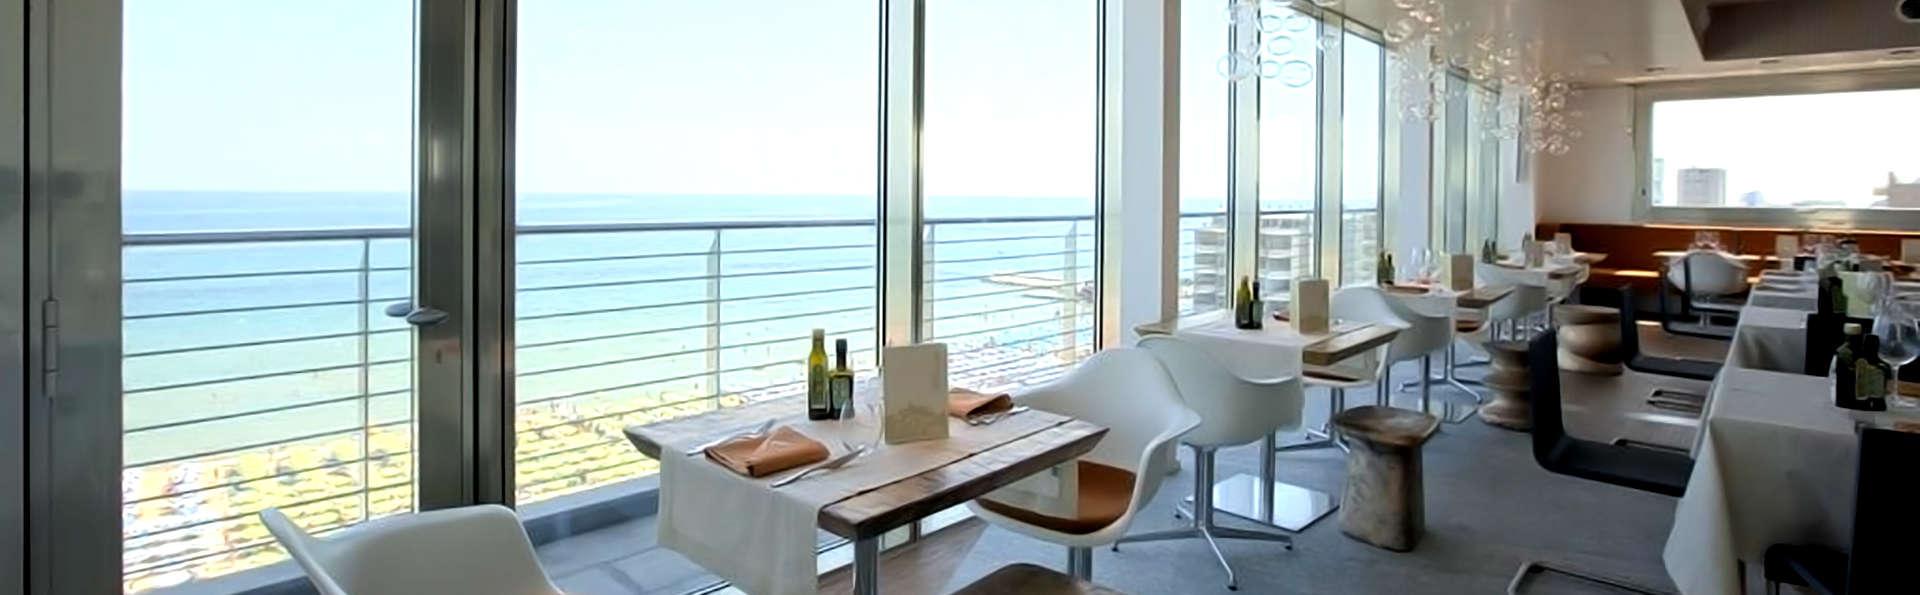 Uappala Hotel Cruiser - Edit_Restaurant6.jpg